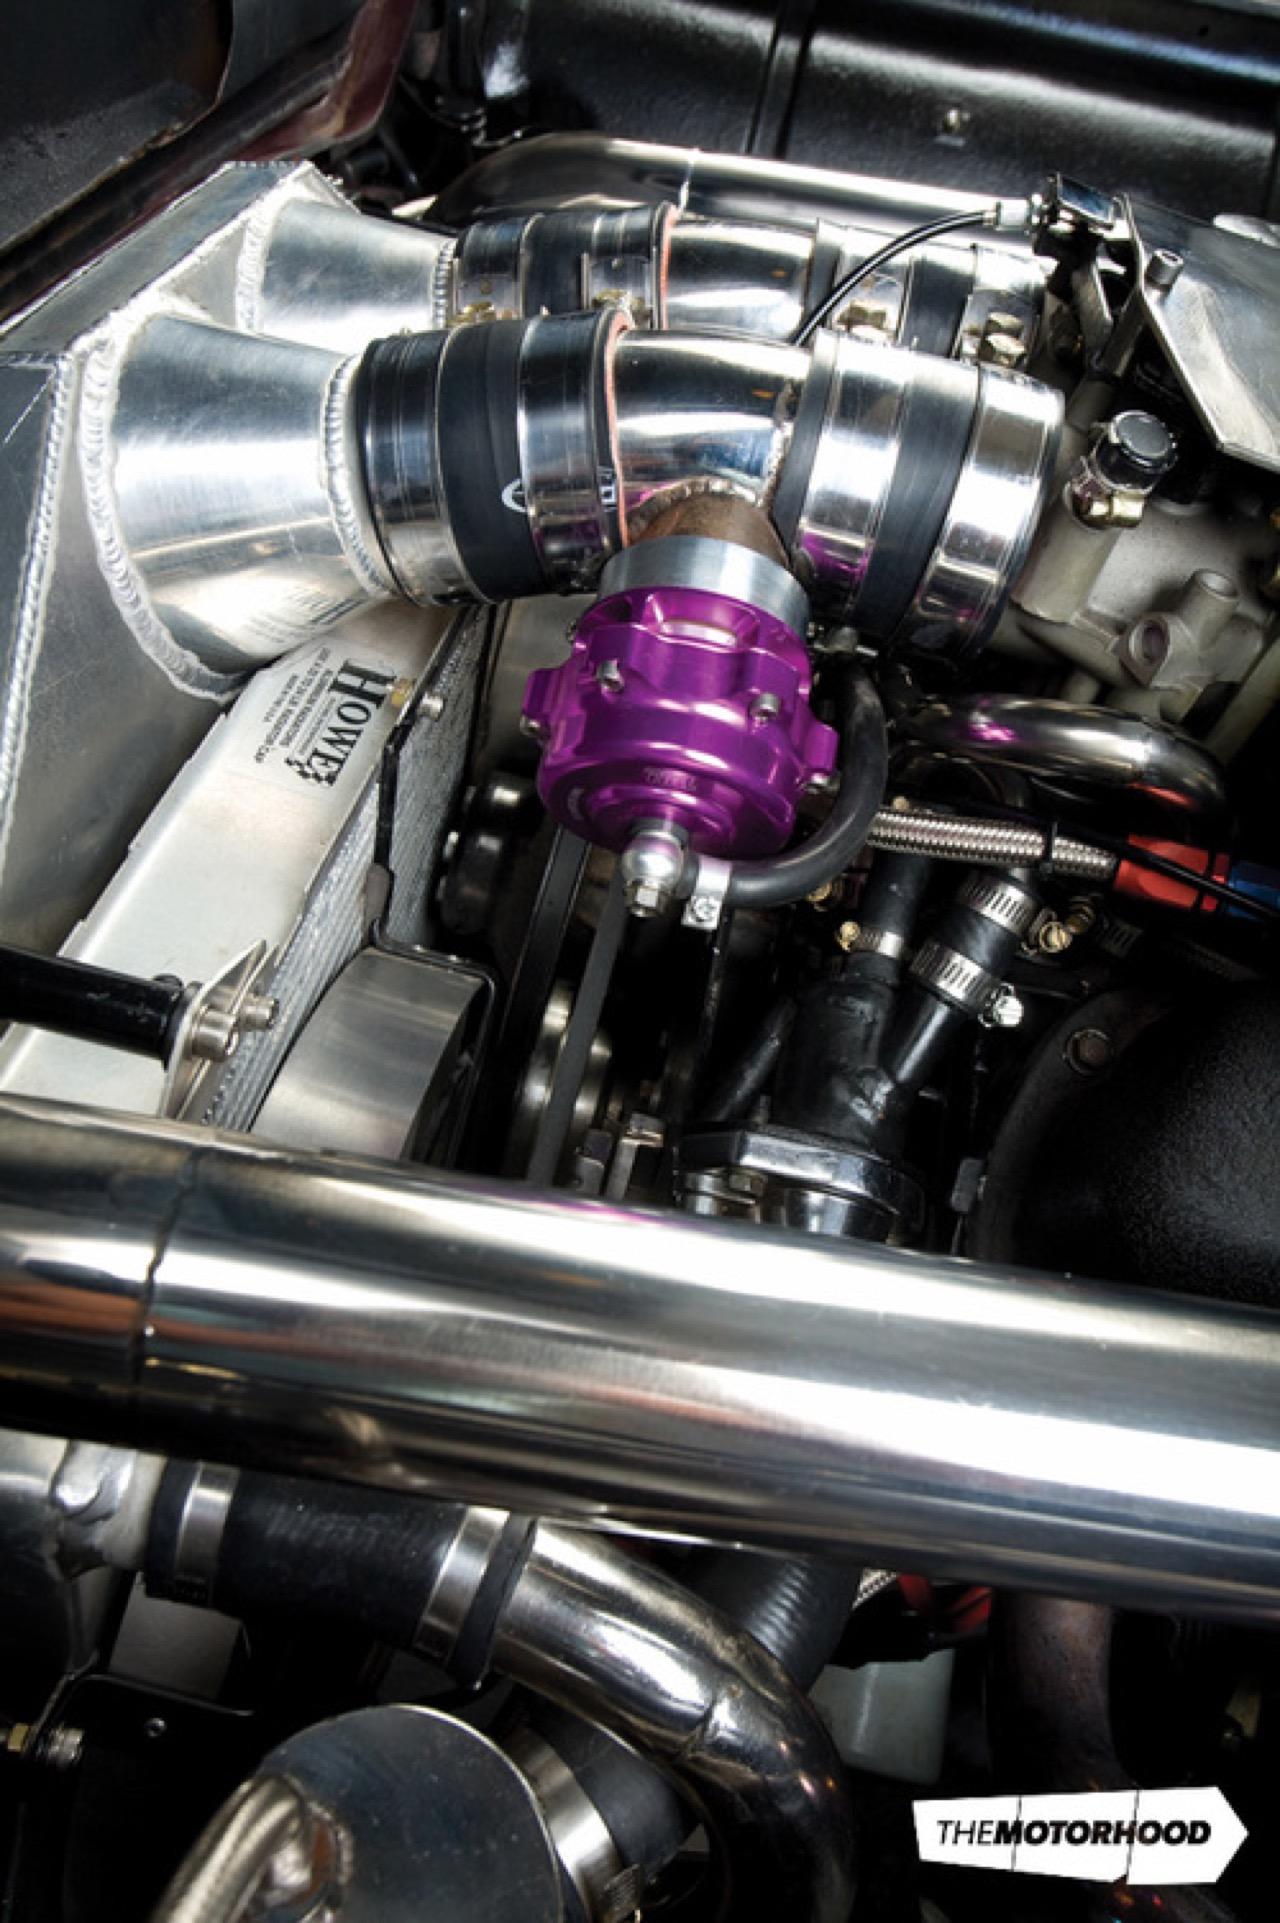 Rusty racer : Twinturbo Ford Thunderbird... 35